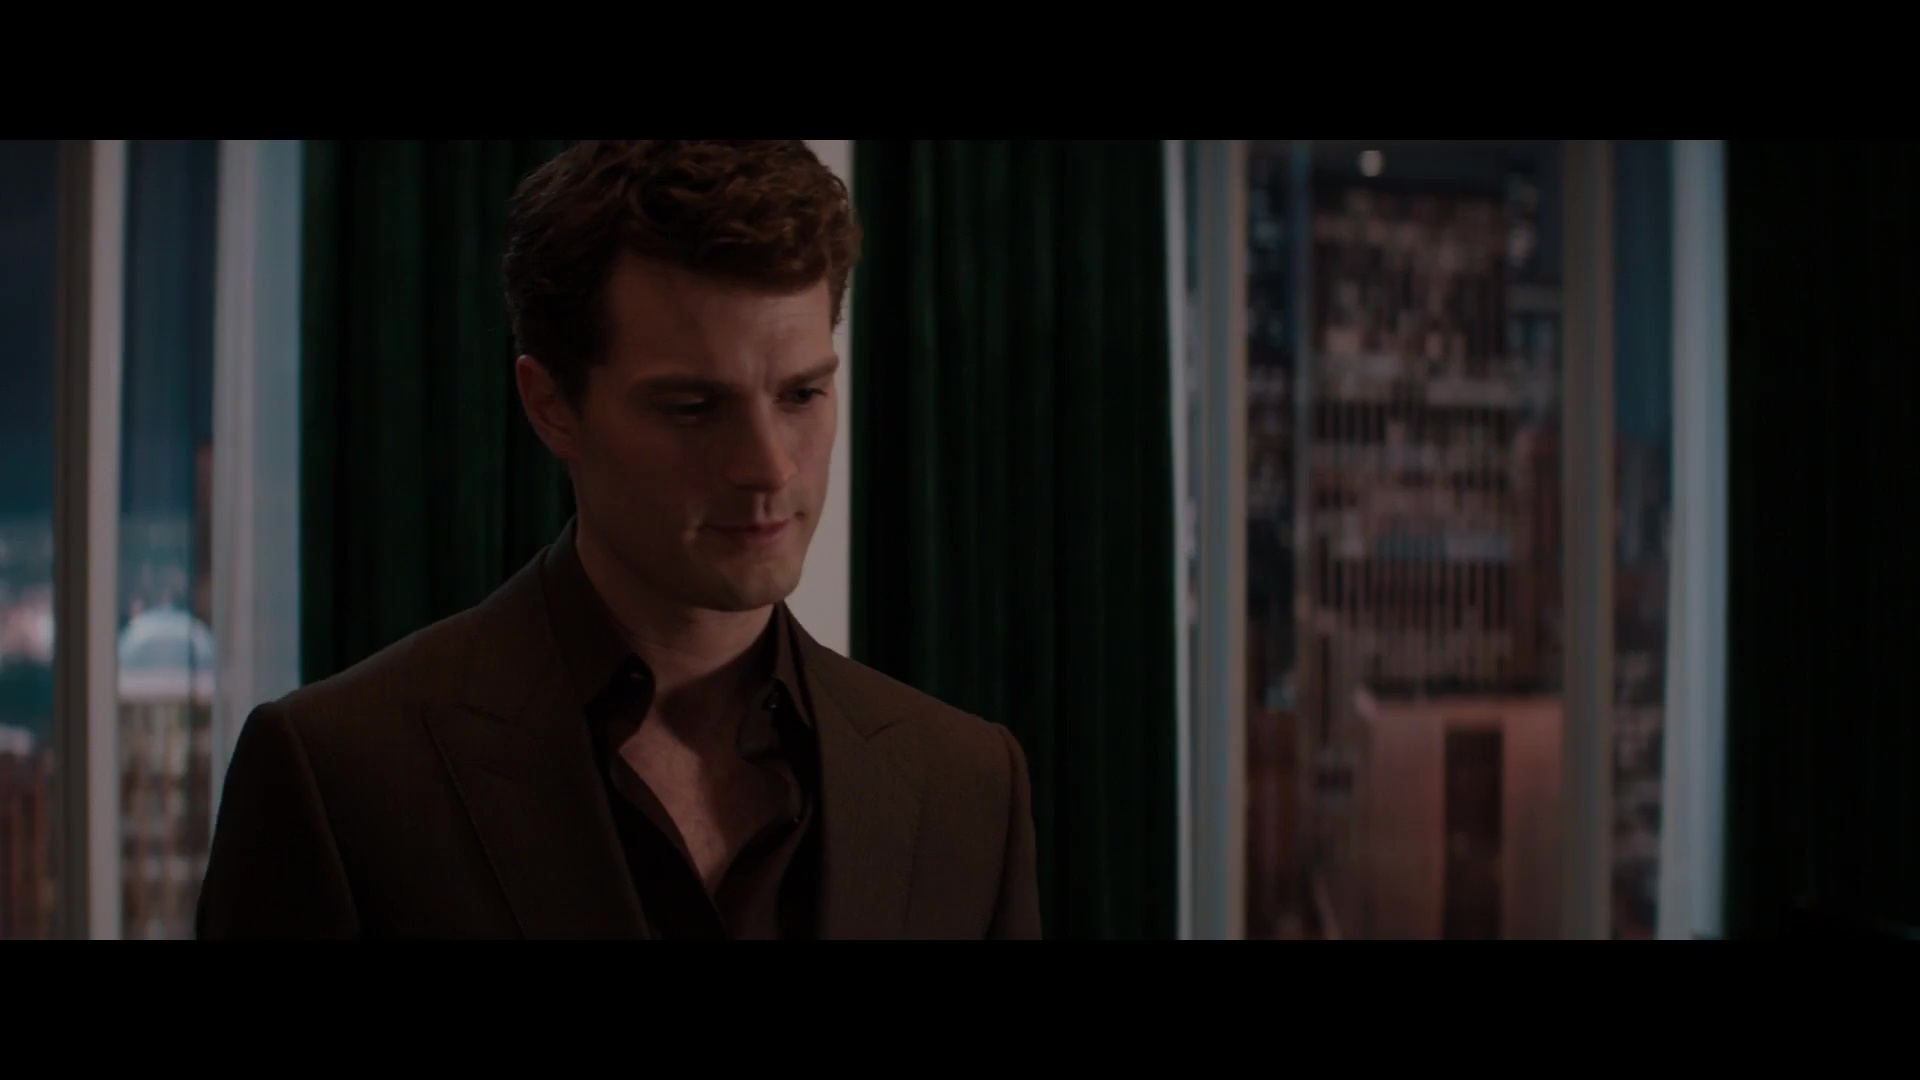 Cincuenta Sombras De Grey 1080p Lat-Cast-Ing 5.1 (2015)